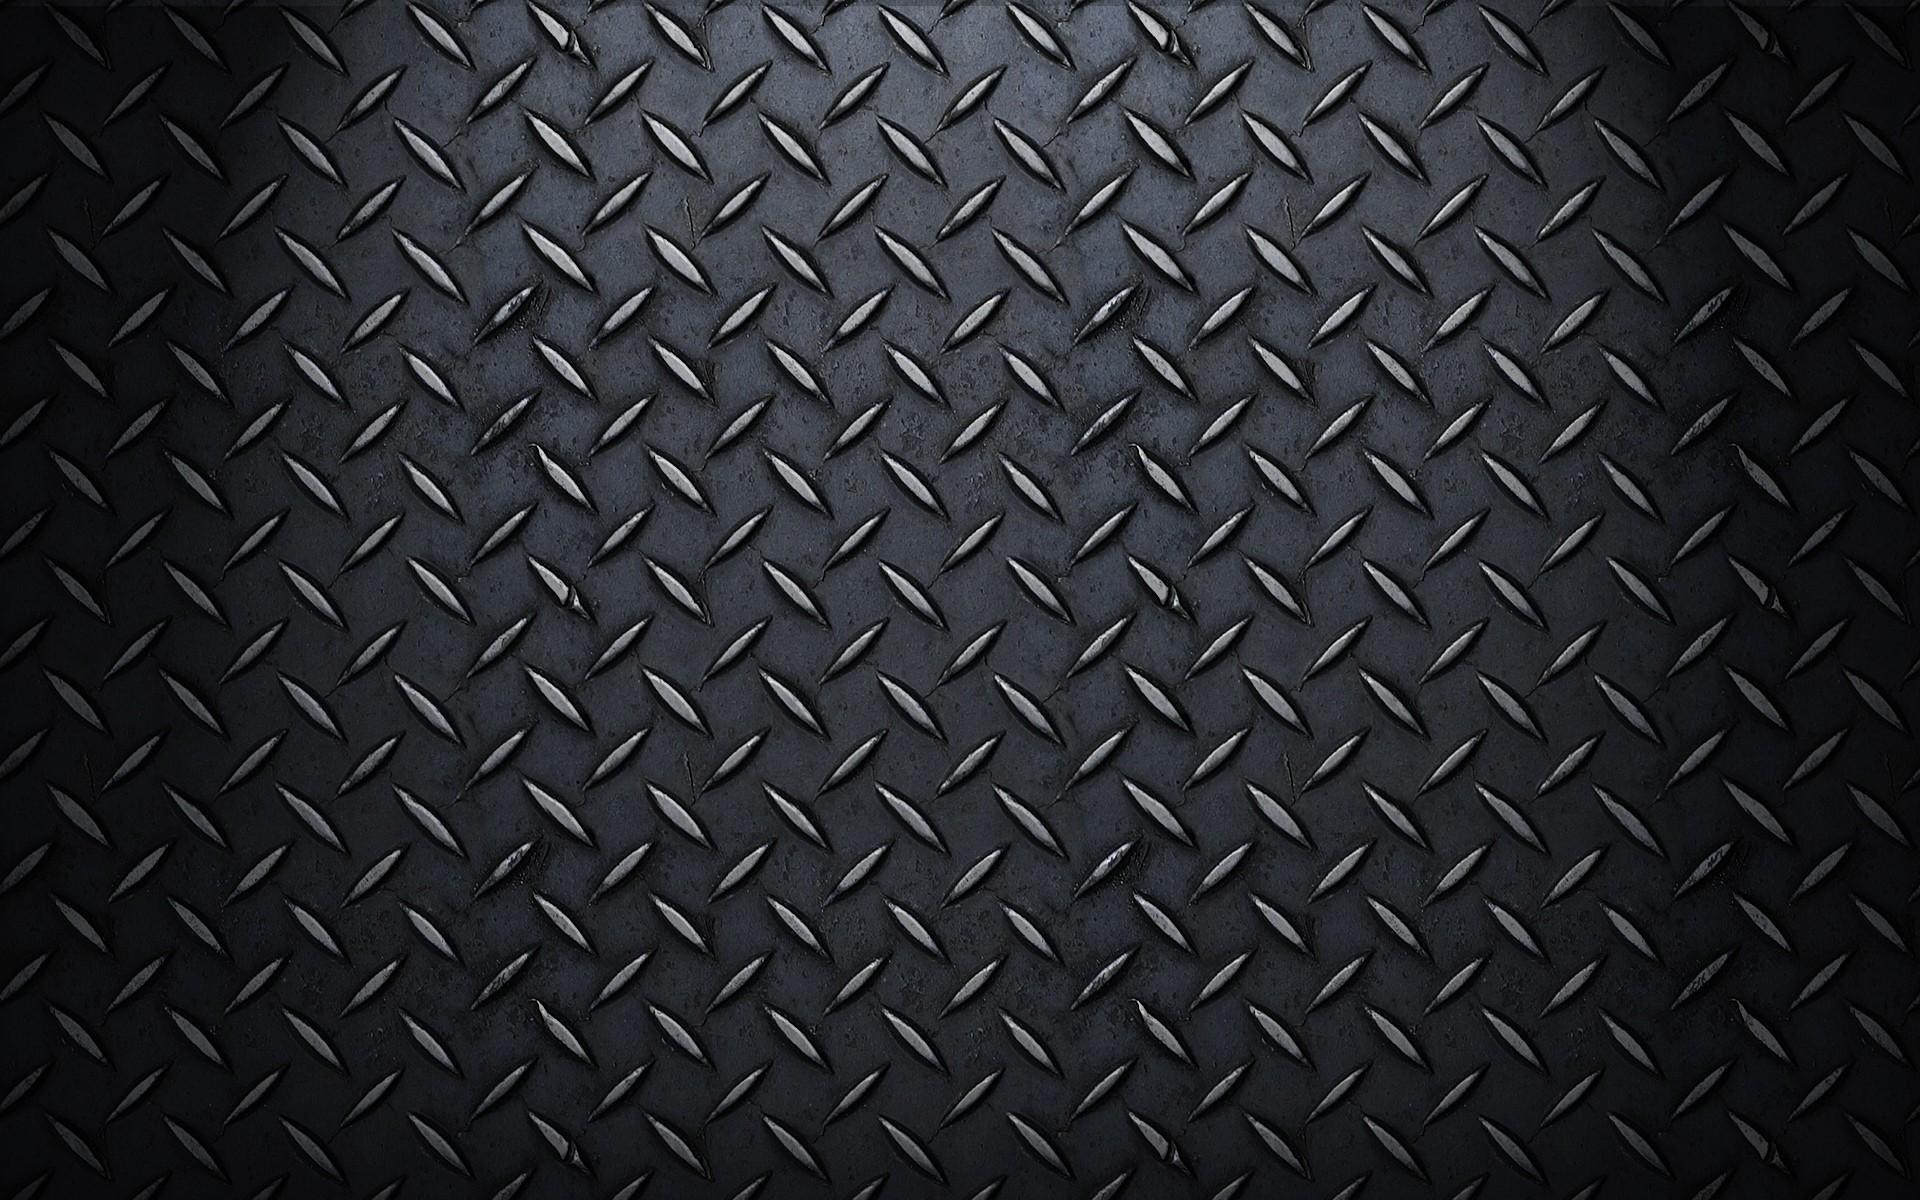 Carbon Fiber Pattern Photoshop wallpaper 106855